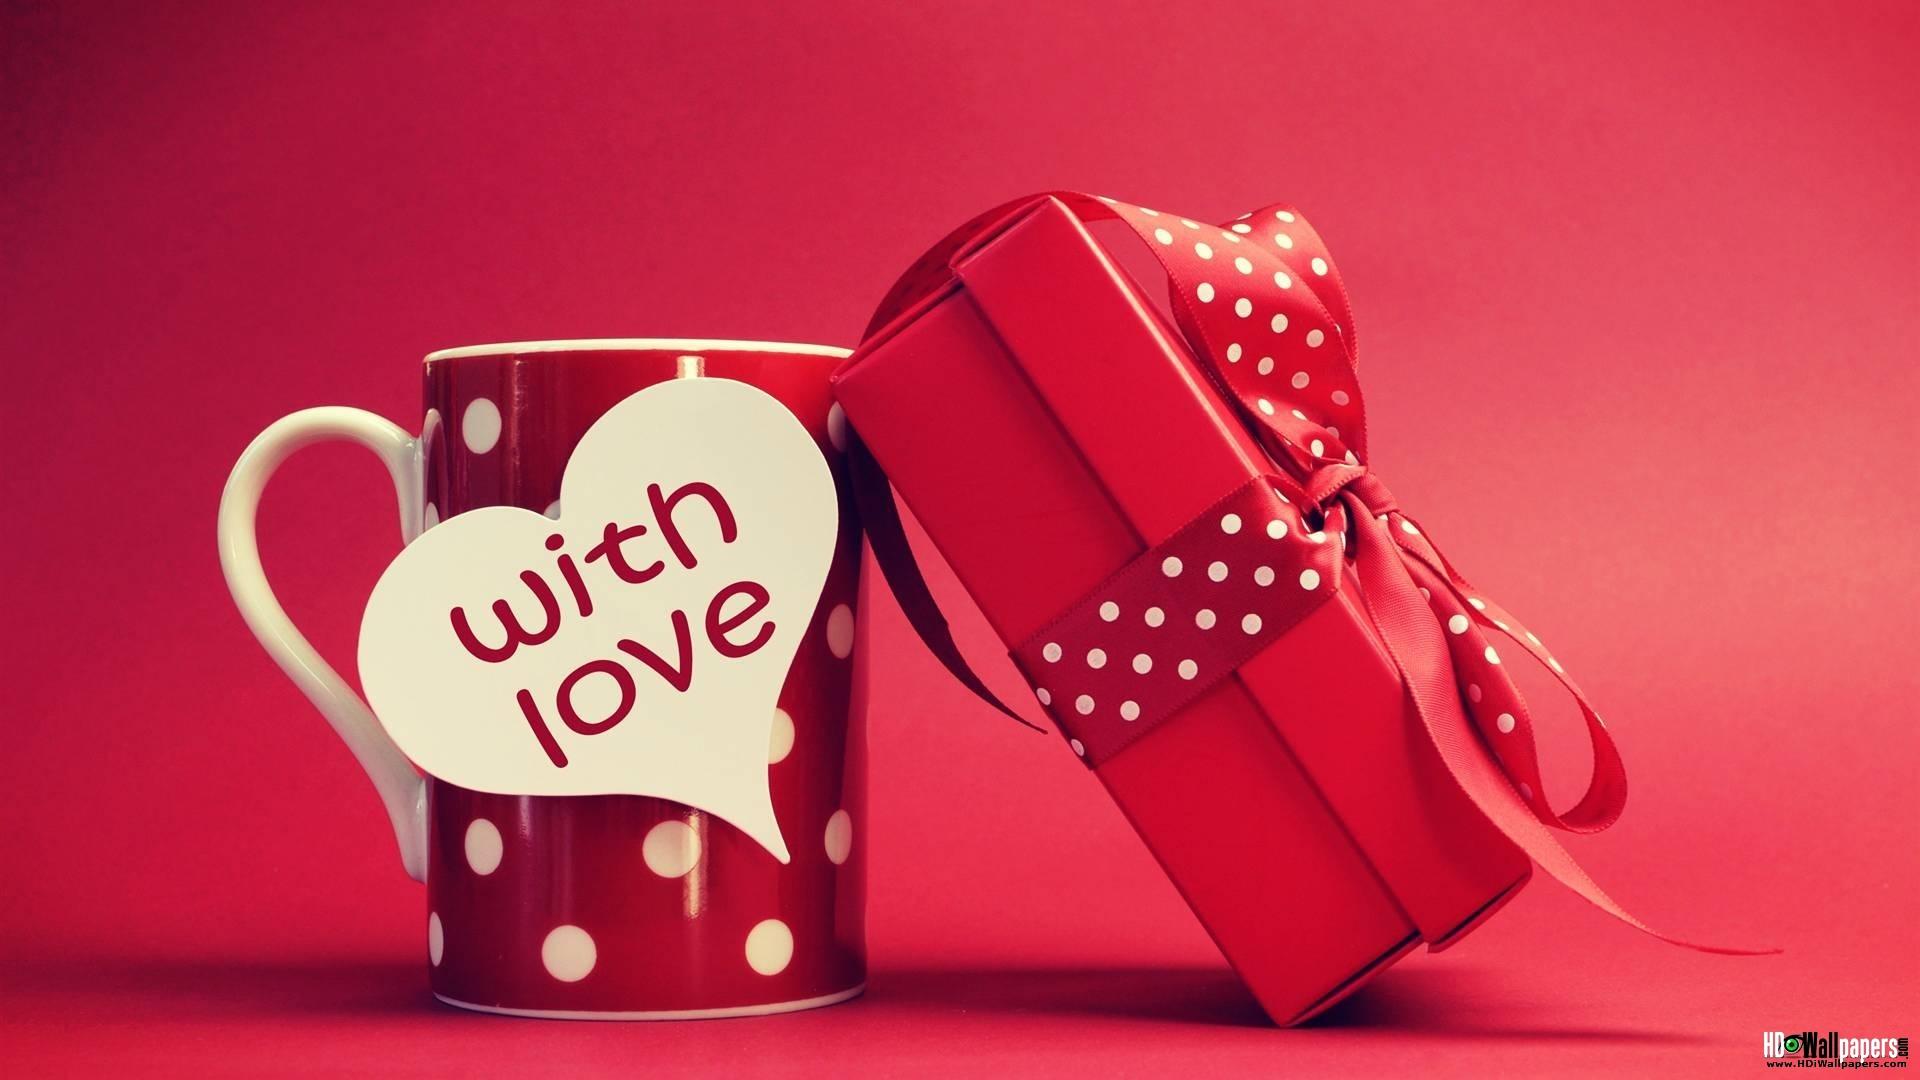 Love Wallpaper For Mobile Free Download 23477 Hd Wallpaper